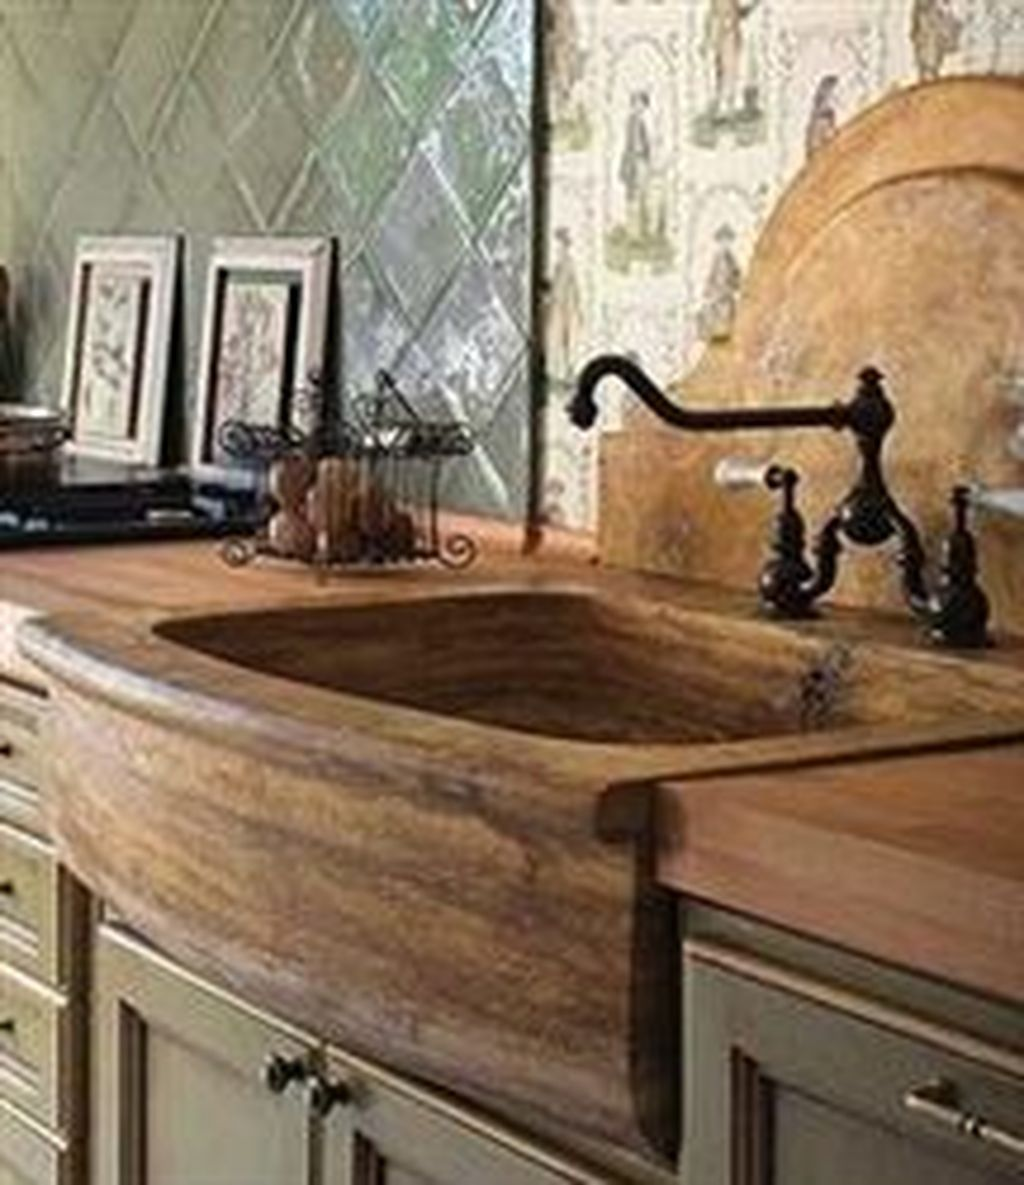 37 stunning kohler farmhouse sink ideas to improve your